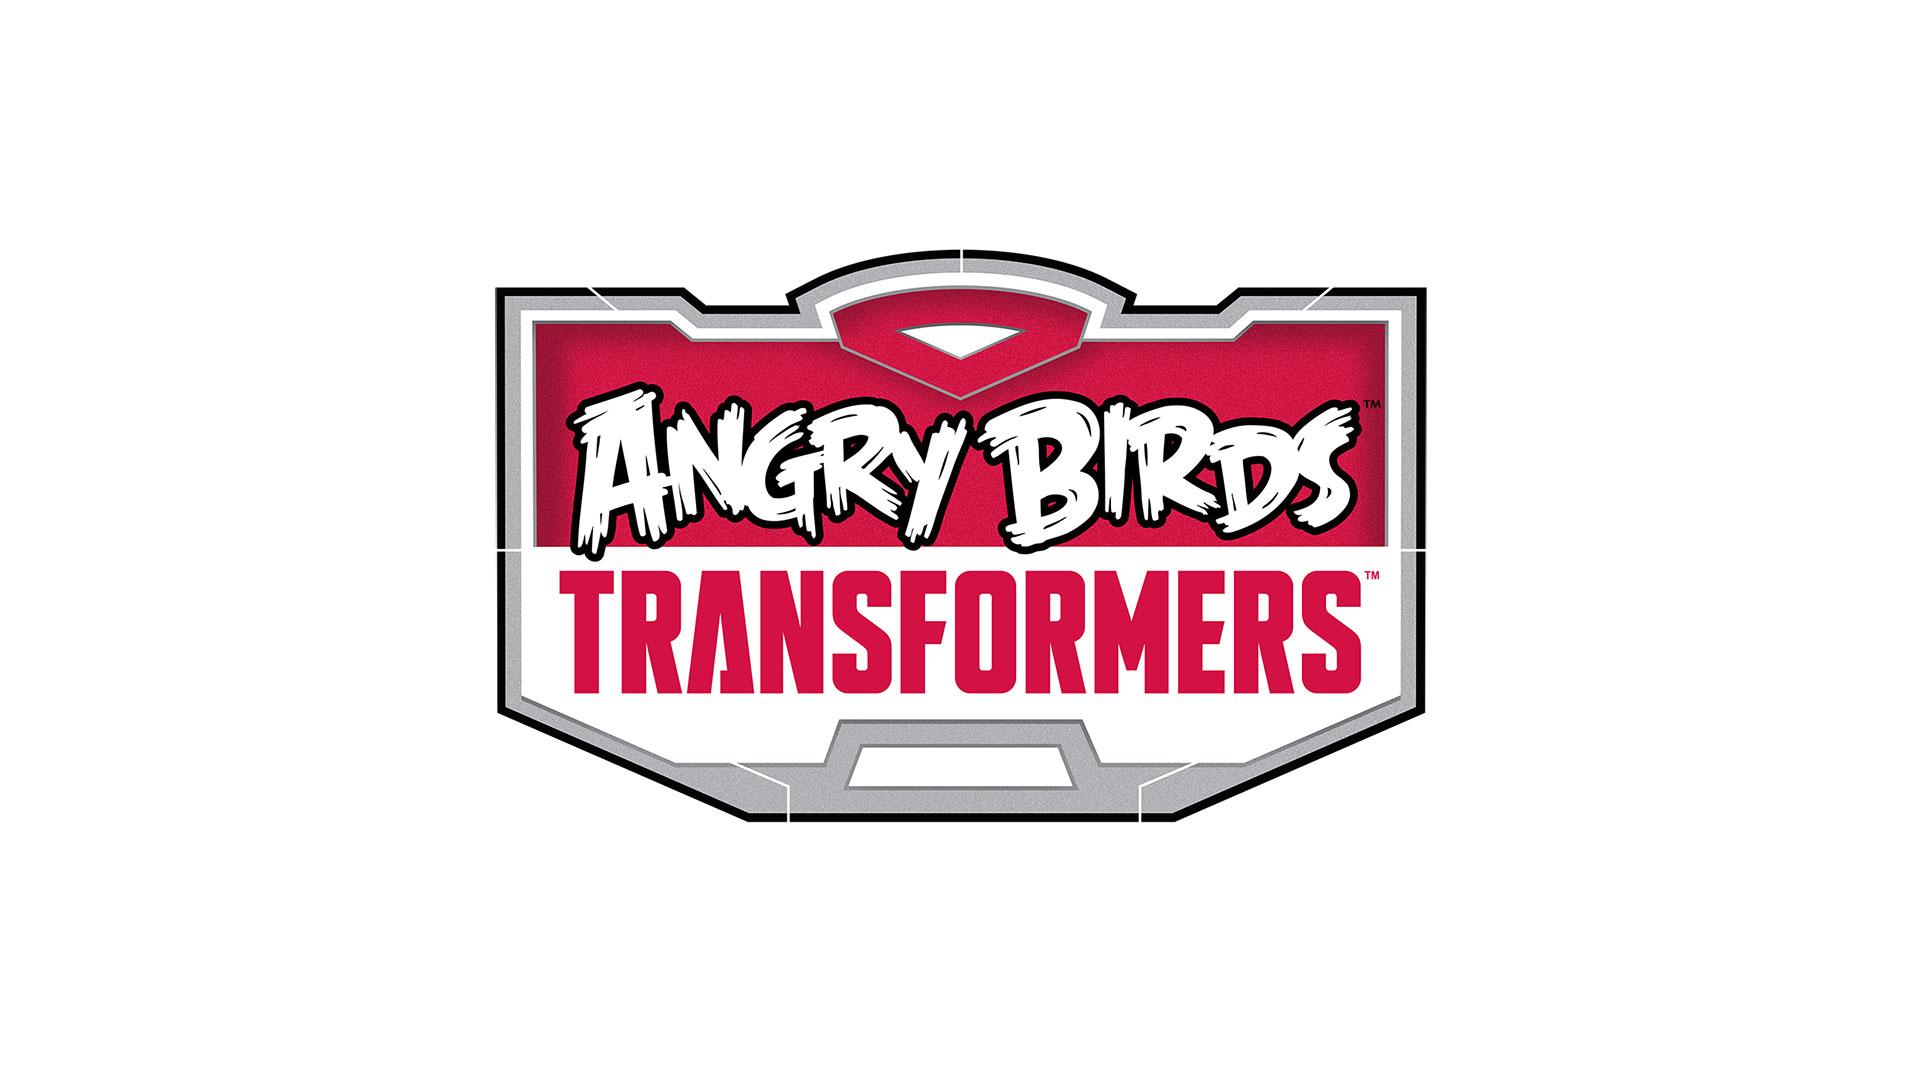 Angry-Birds-Transformers-Logo-1920x1080-wallpaper-wp3402400